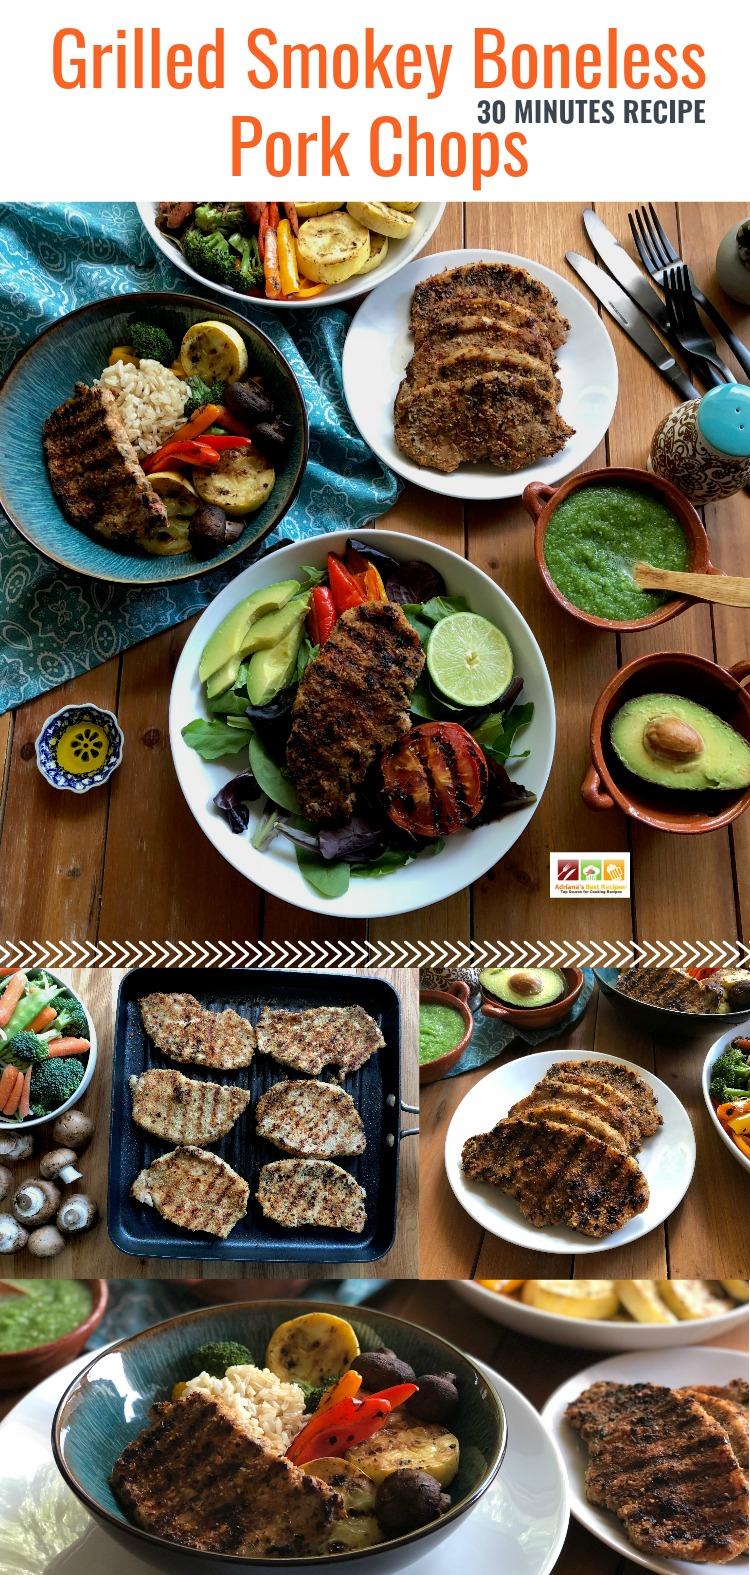 Grilled Smokey Boneless Pork Chops Dinner Options